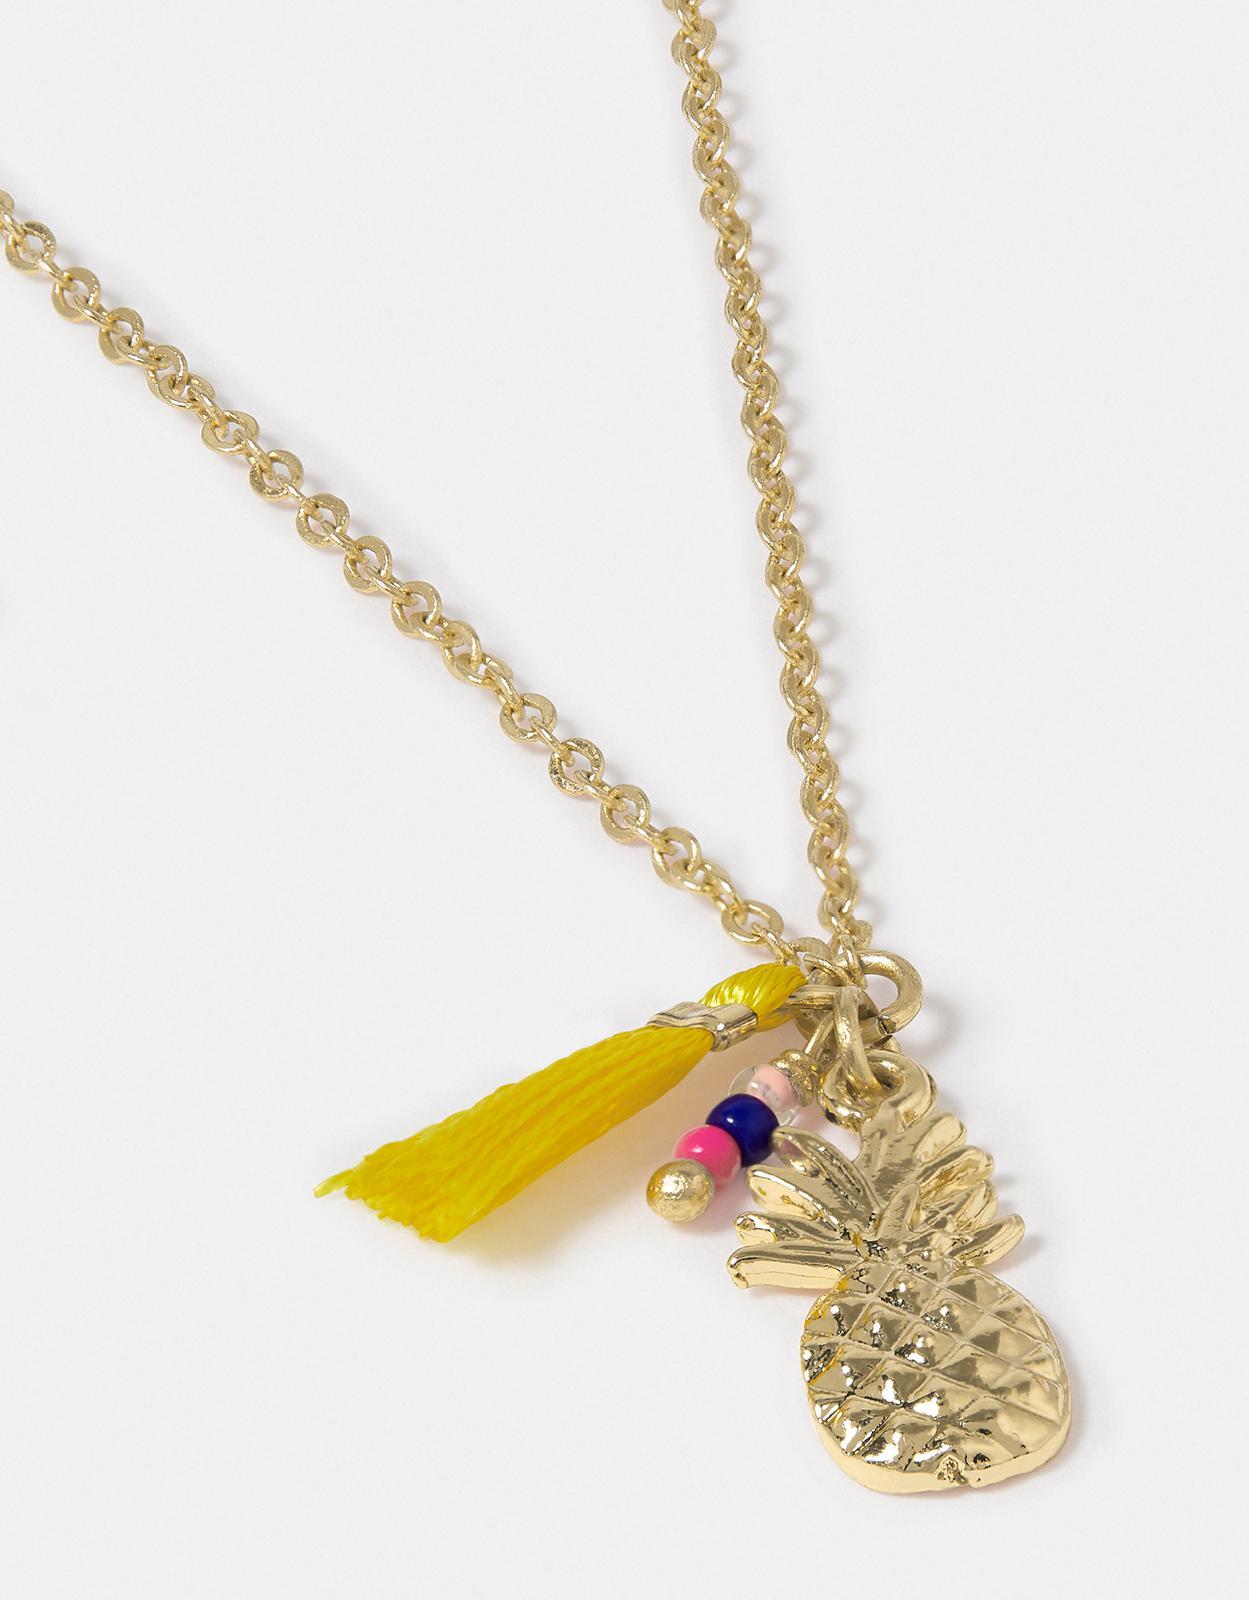 Accessorize Cutesy Pineapple Pendant Necklace in Gold (Metallic)